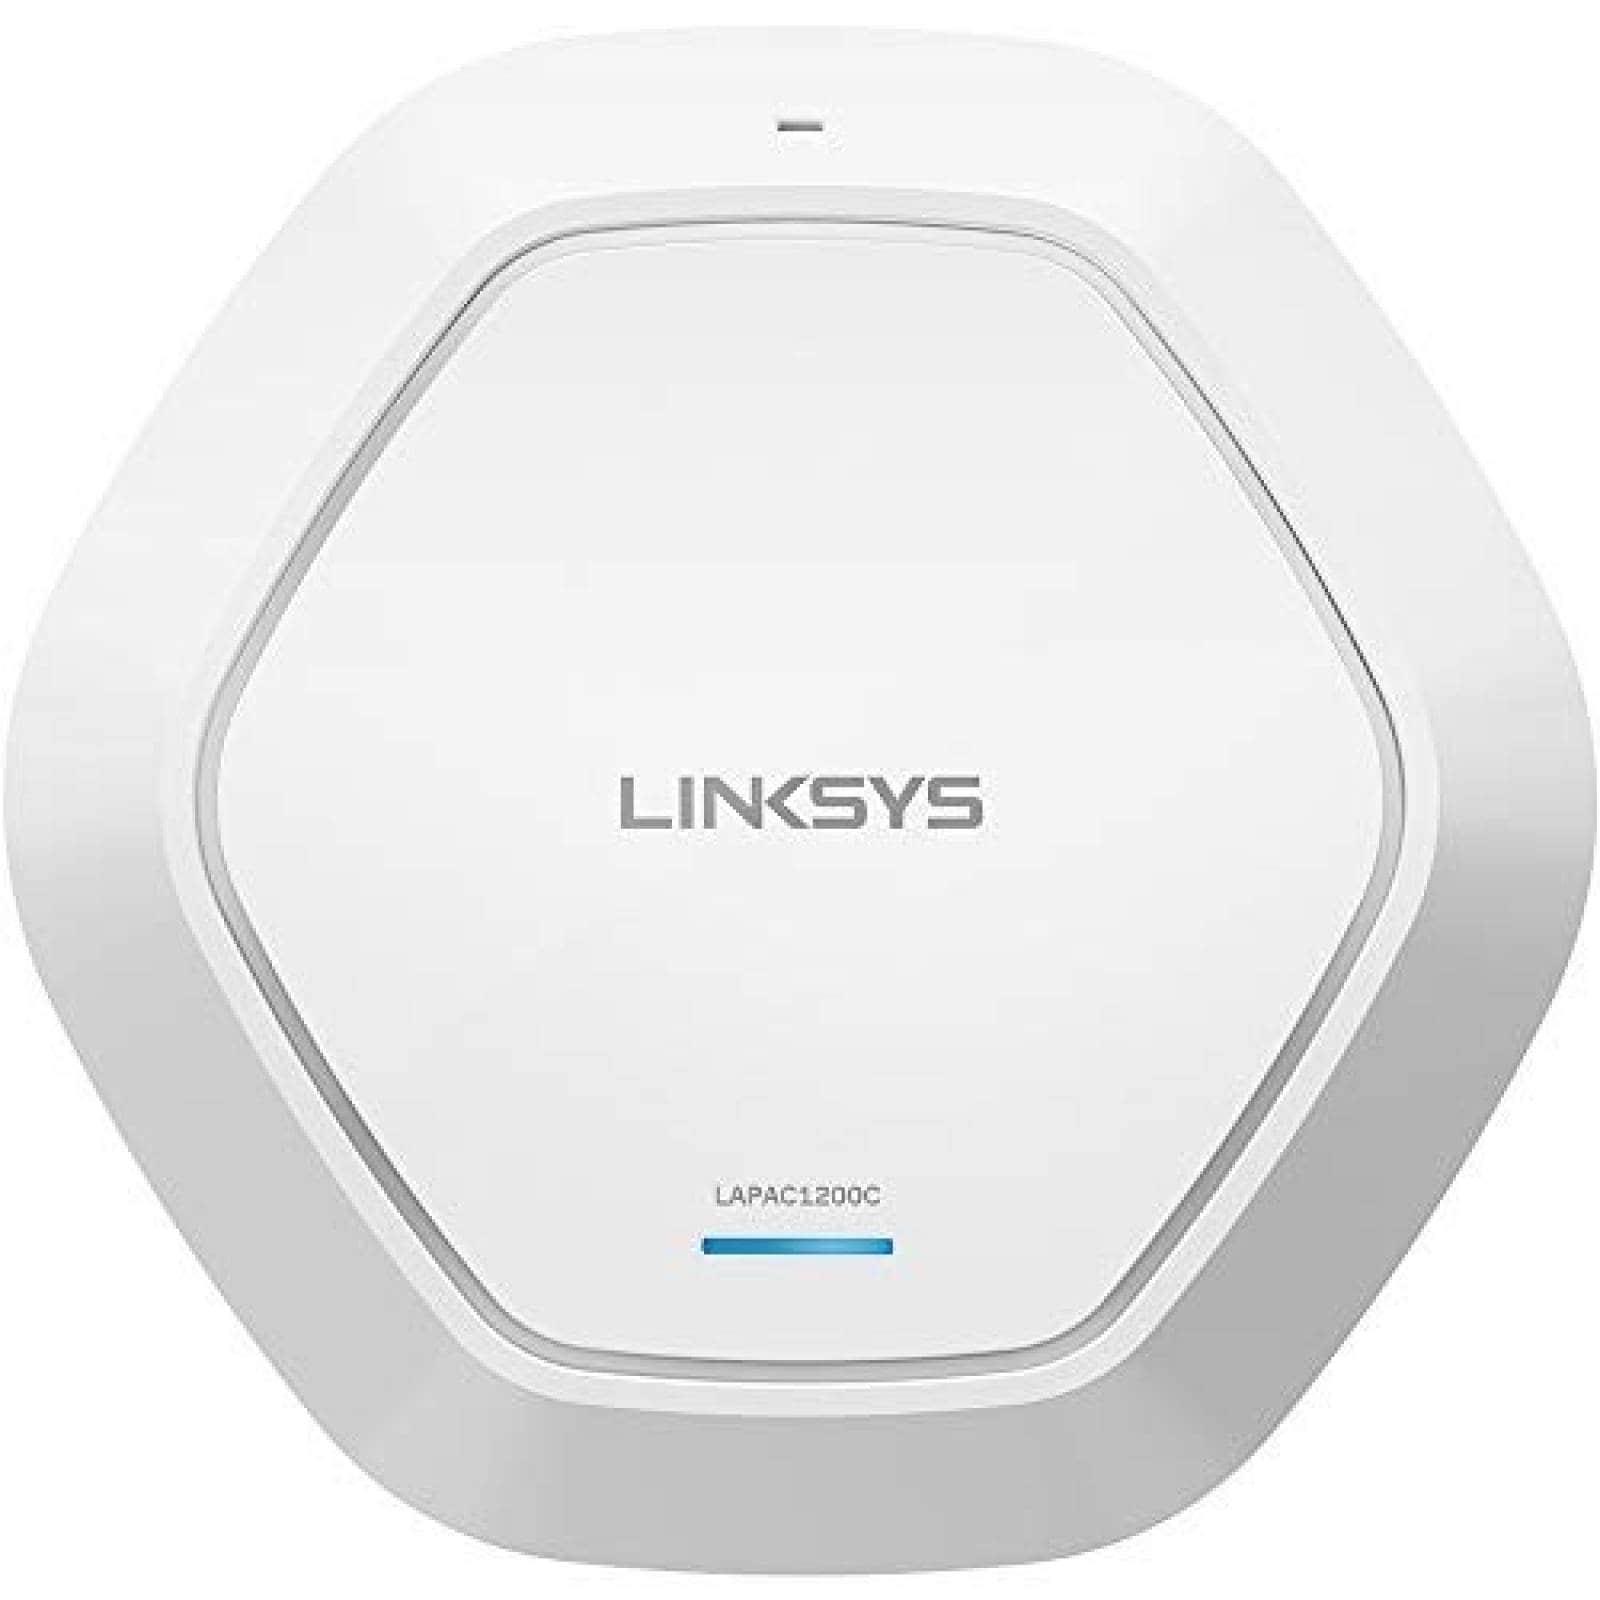 Punto de acceso Linksys AC1200 WiFi PoE banda dual 2.4-5 GHz